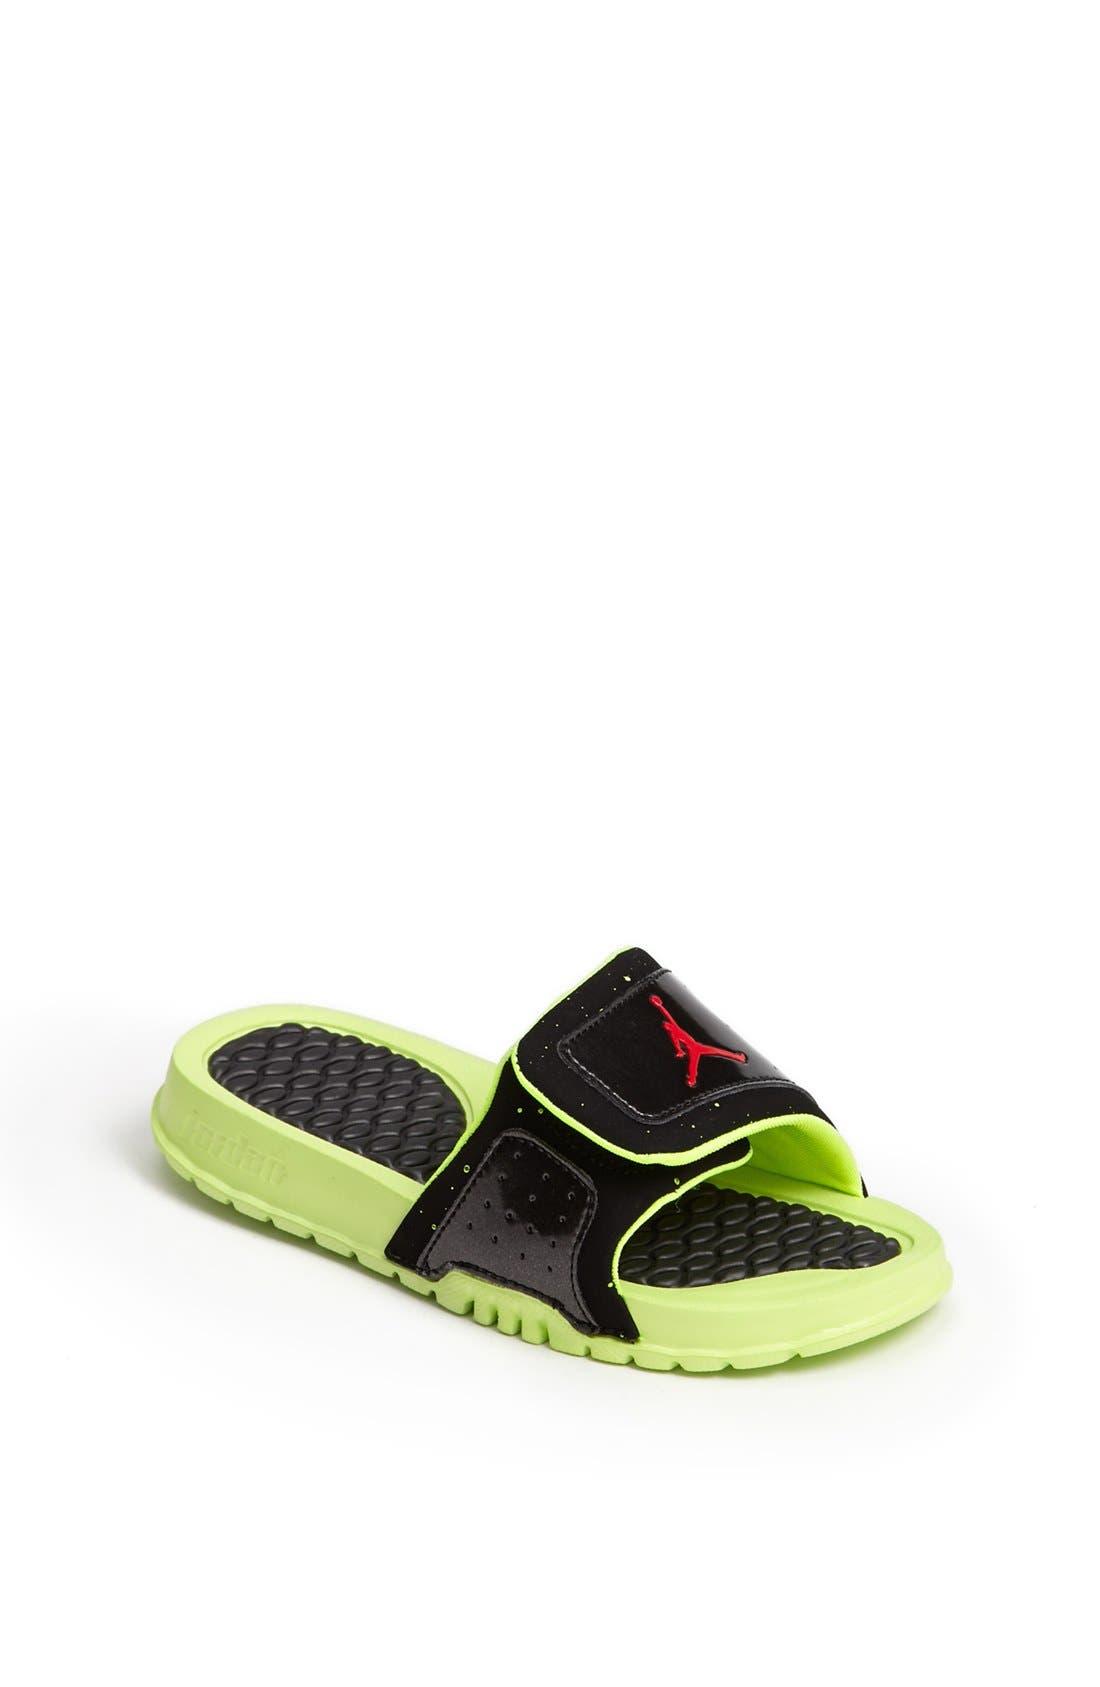 Main Image - Nike 'Jordan Hydro II' Sandal (Toddler & Little Kid)